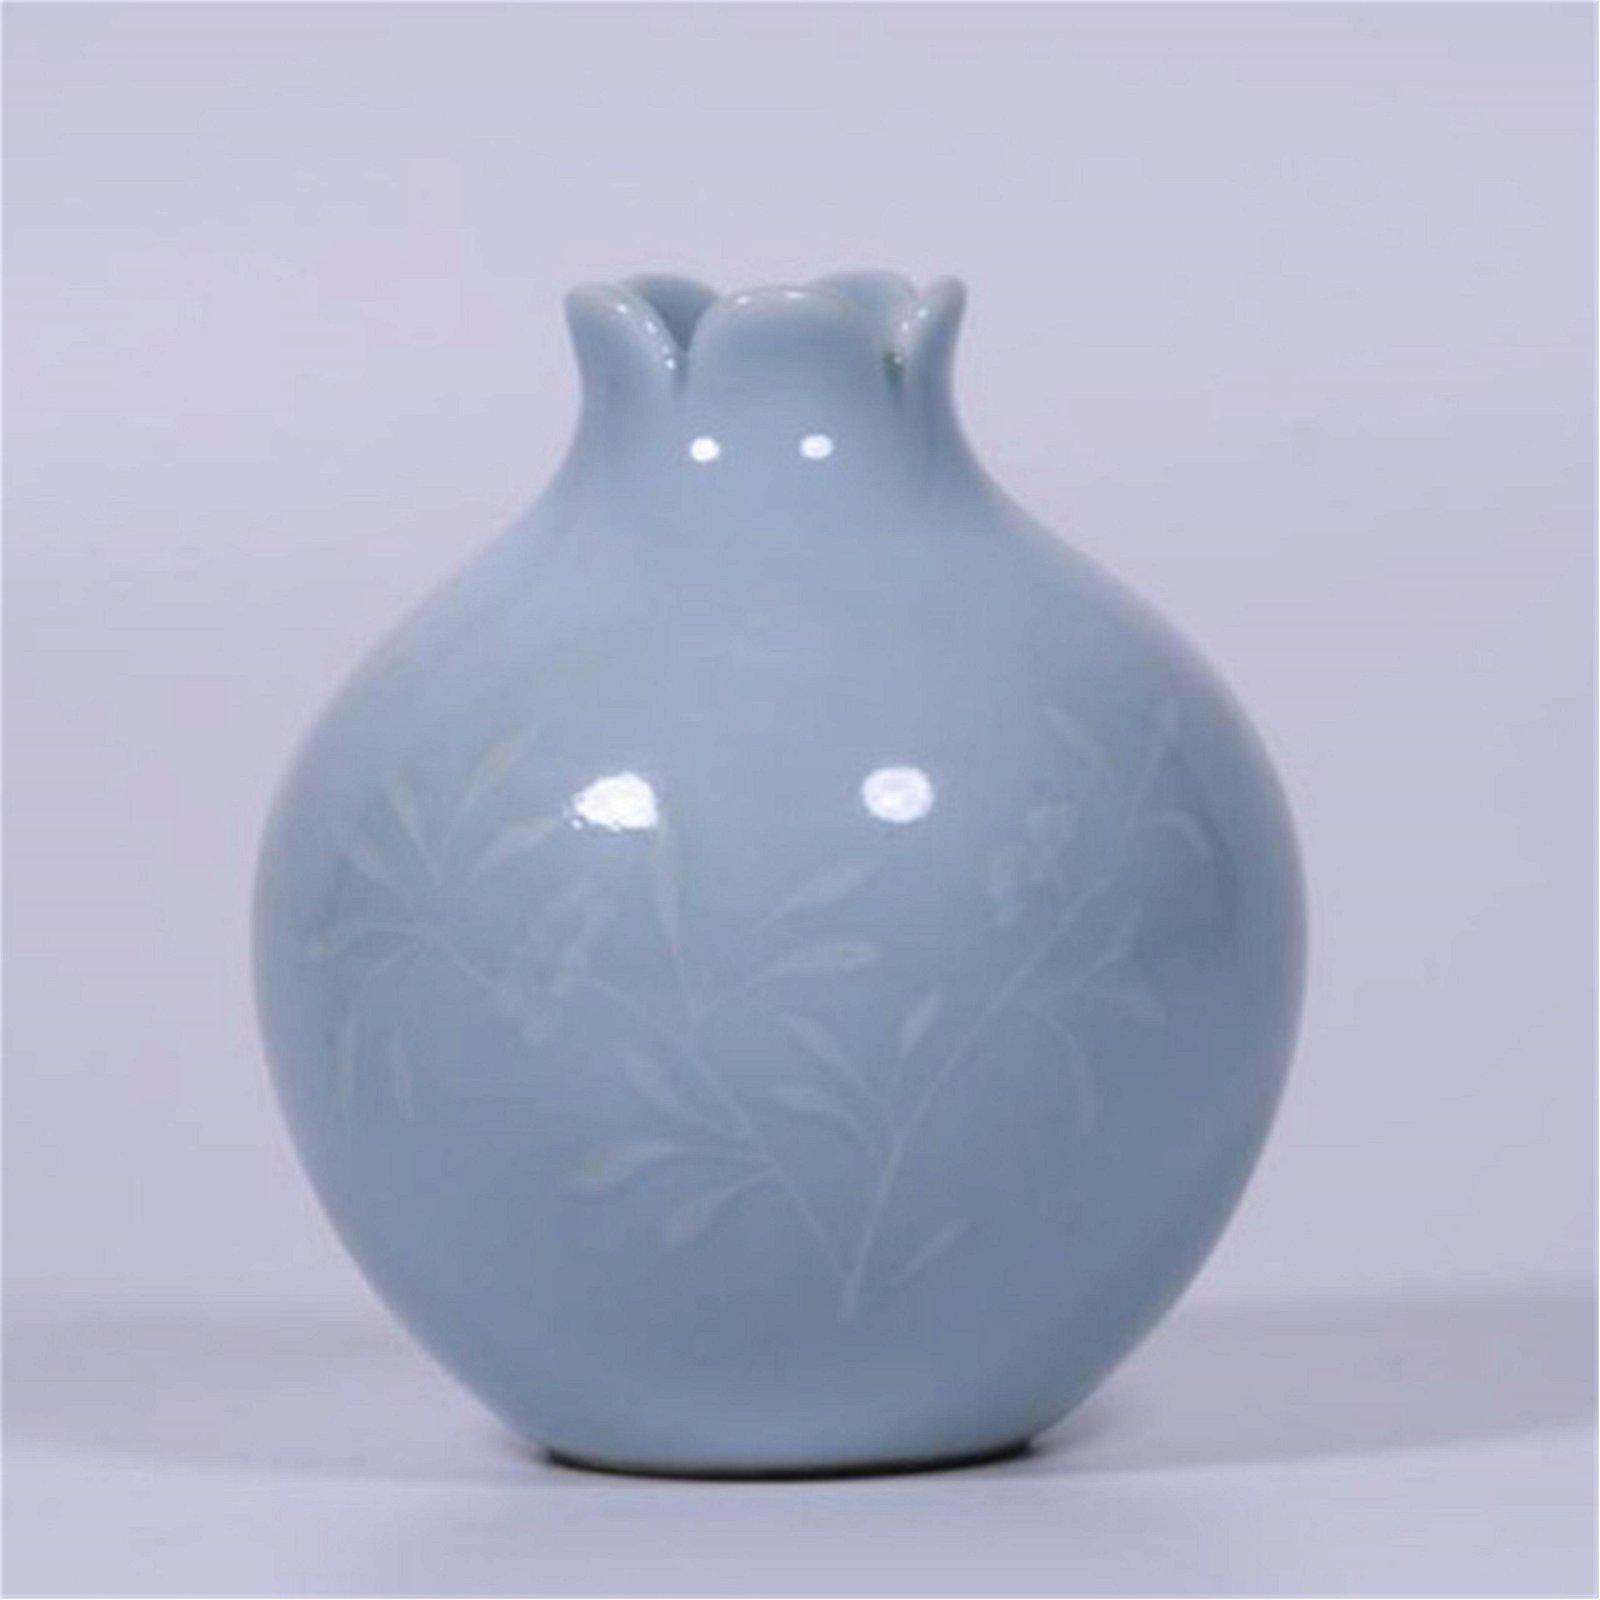 CHINESE PORCELAIN BLUE GLAZE WATER POT